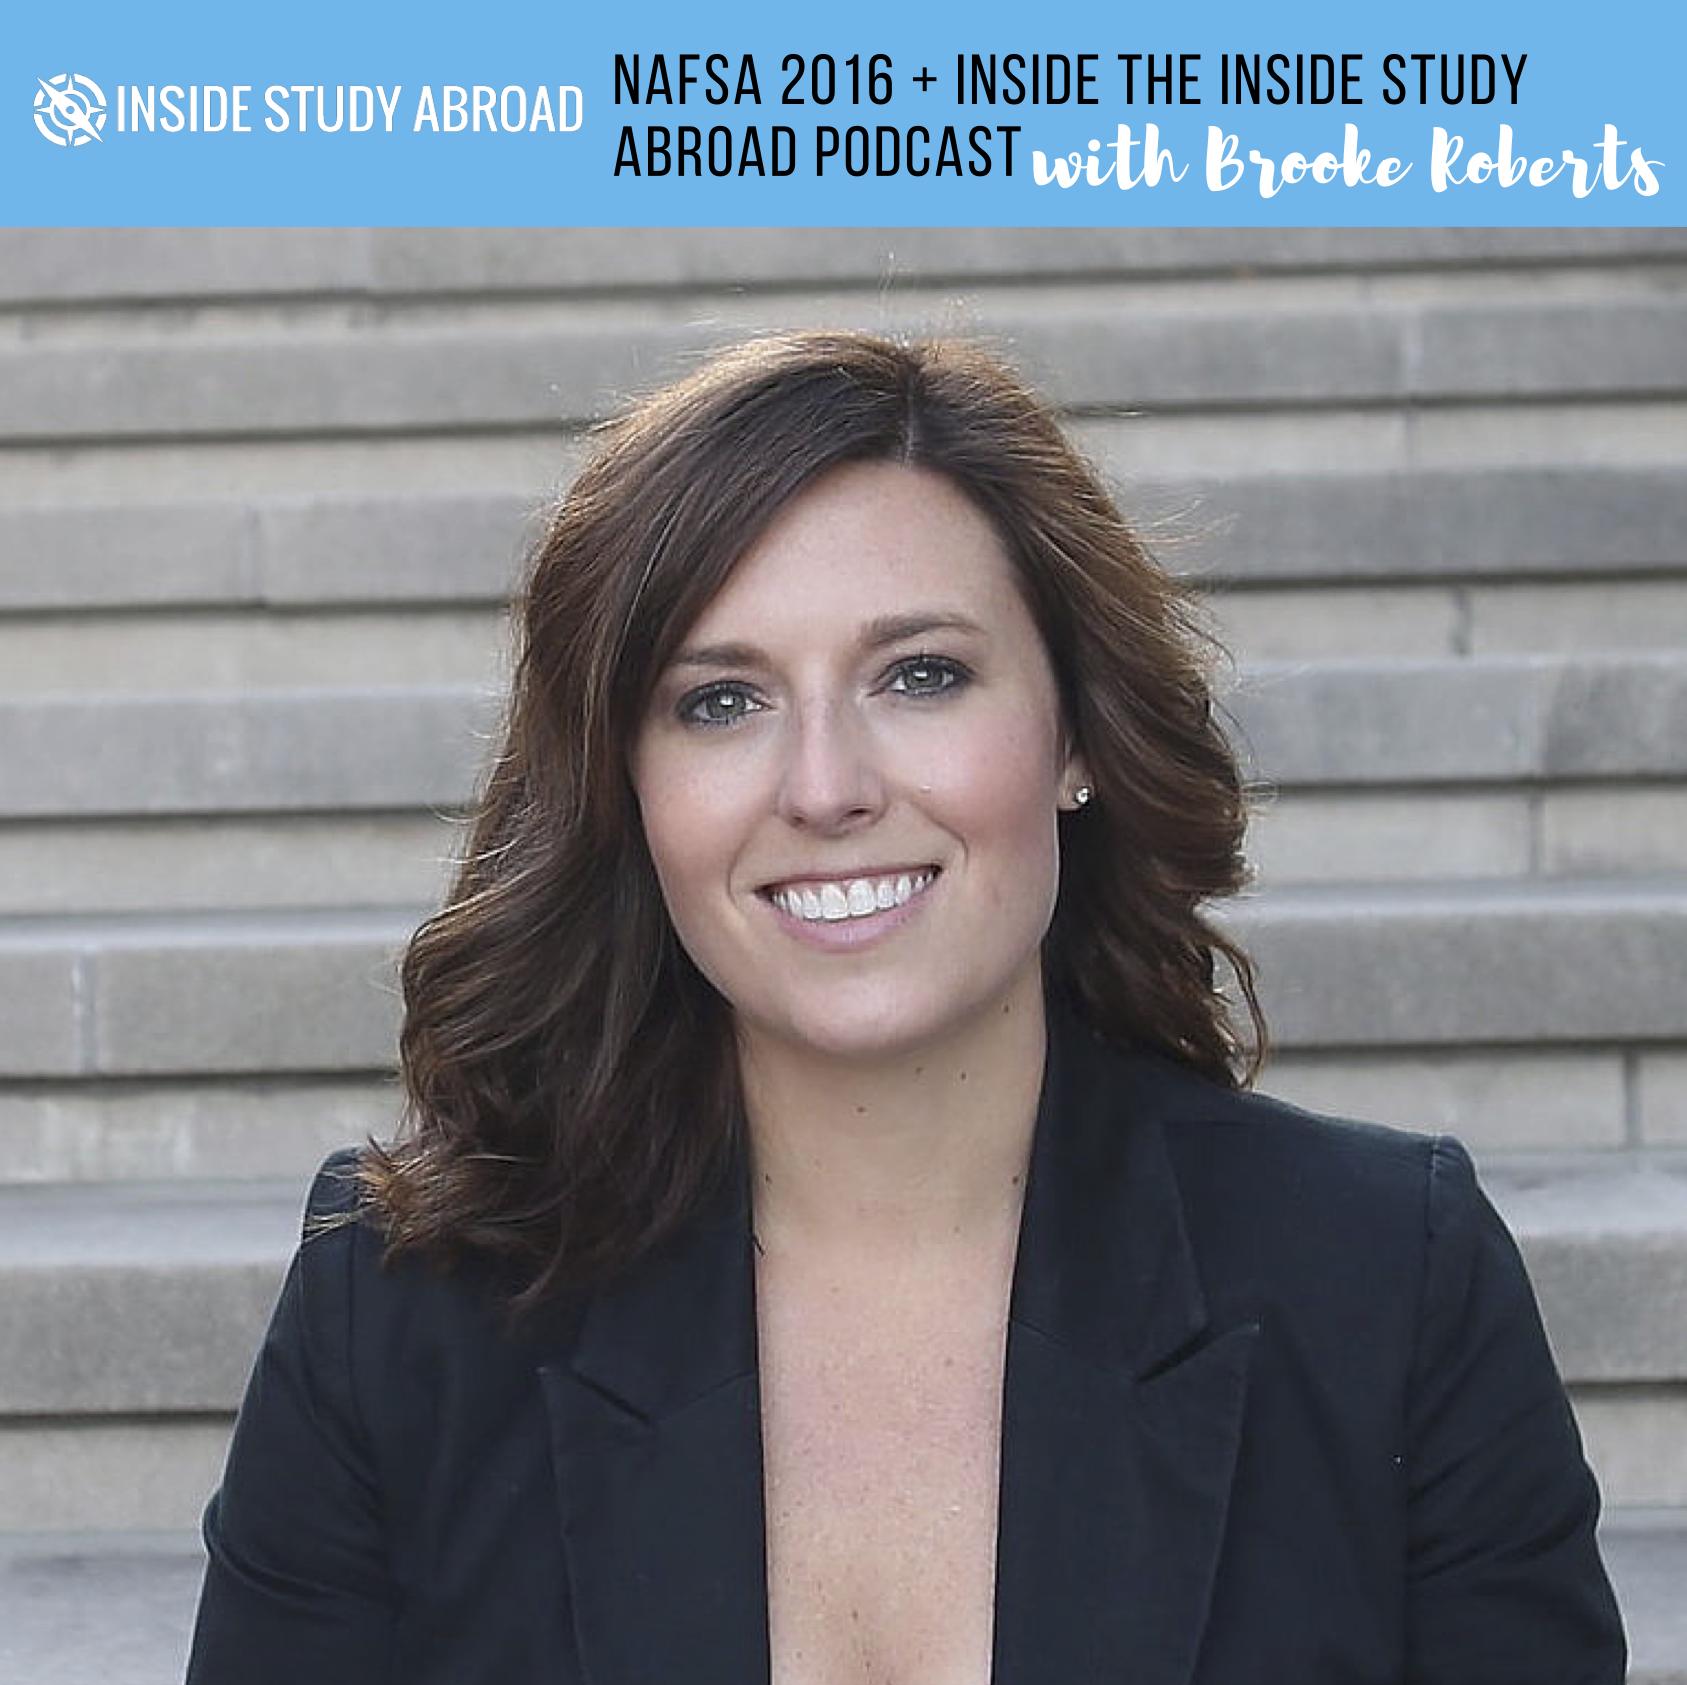 Brooke Roberts - Inside Study Abroad Podcast Episode 3